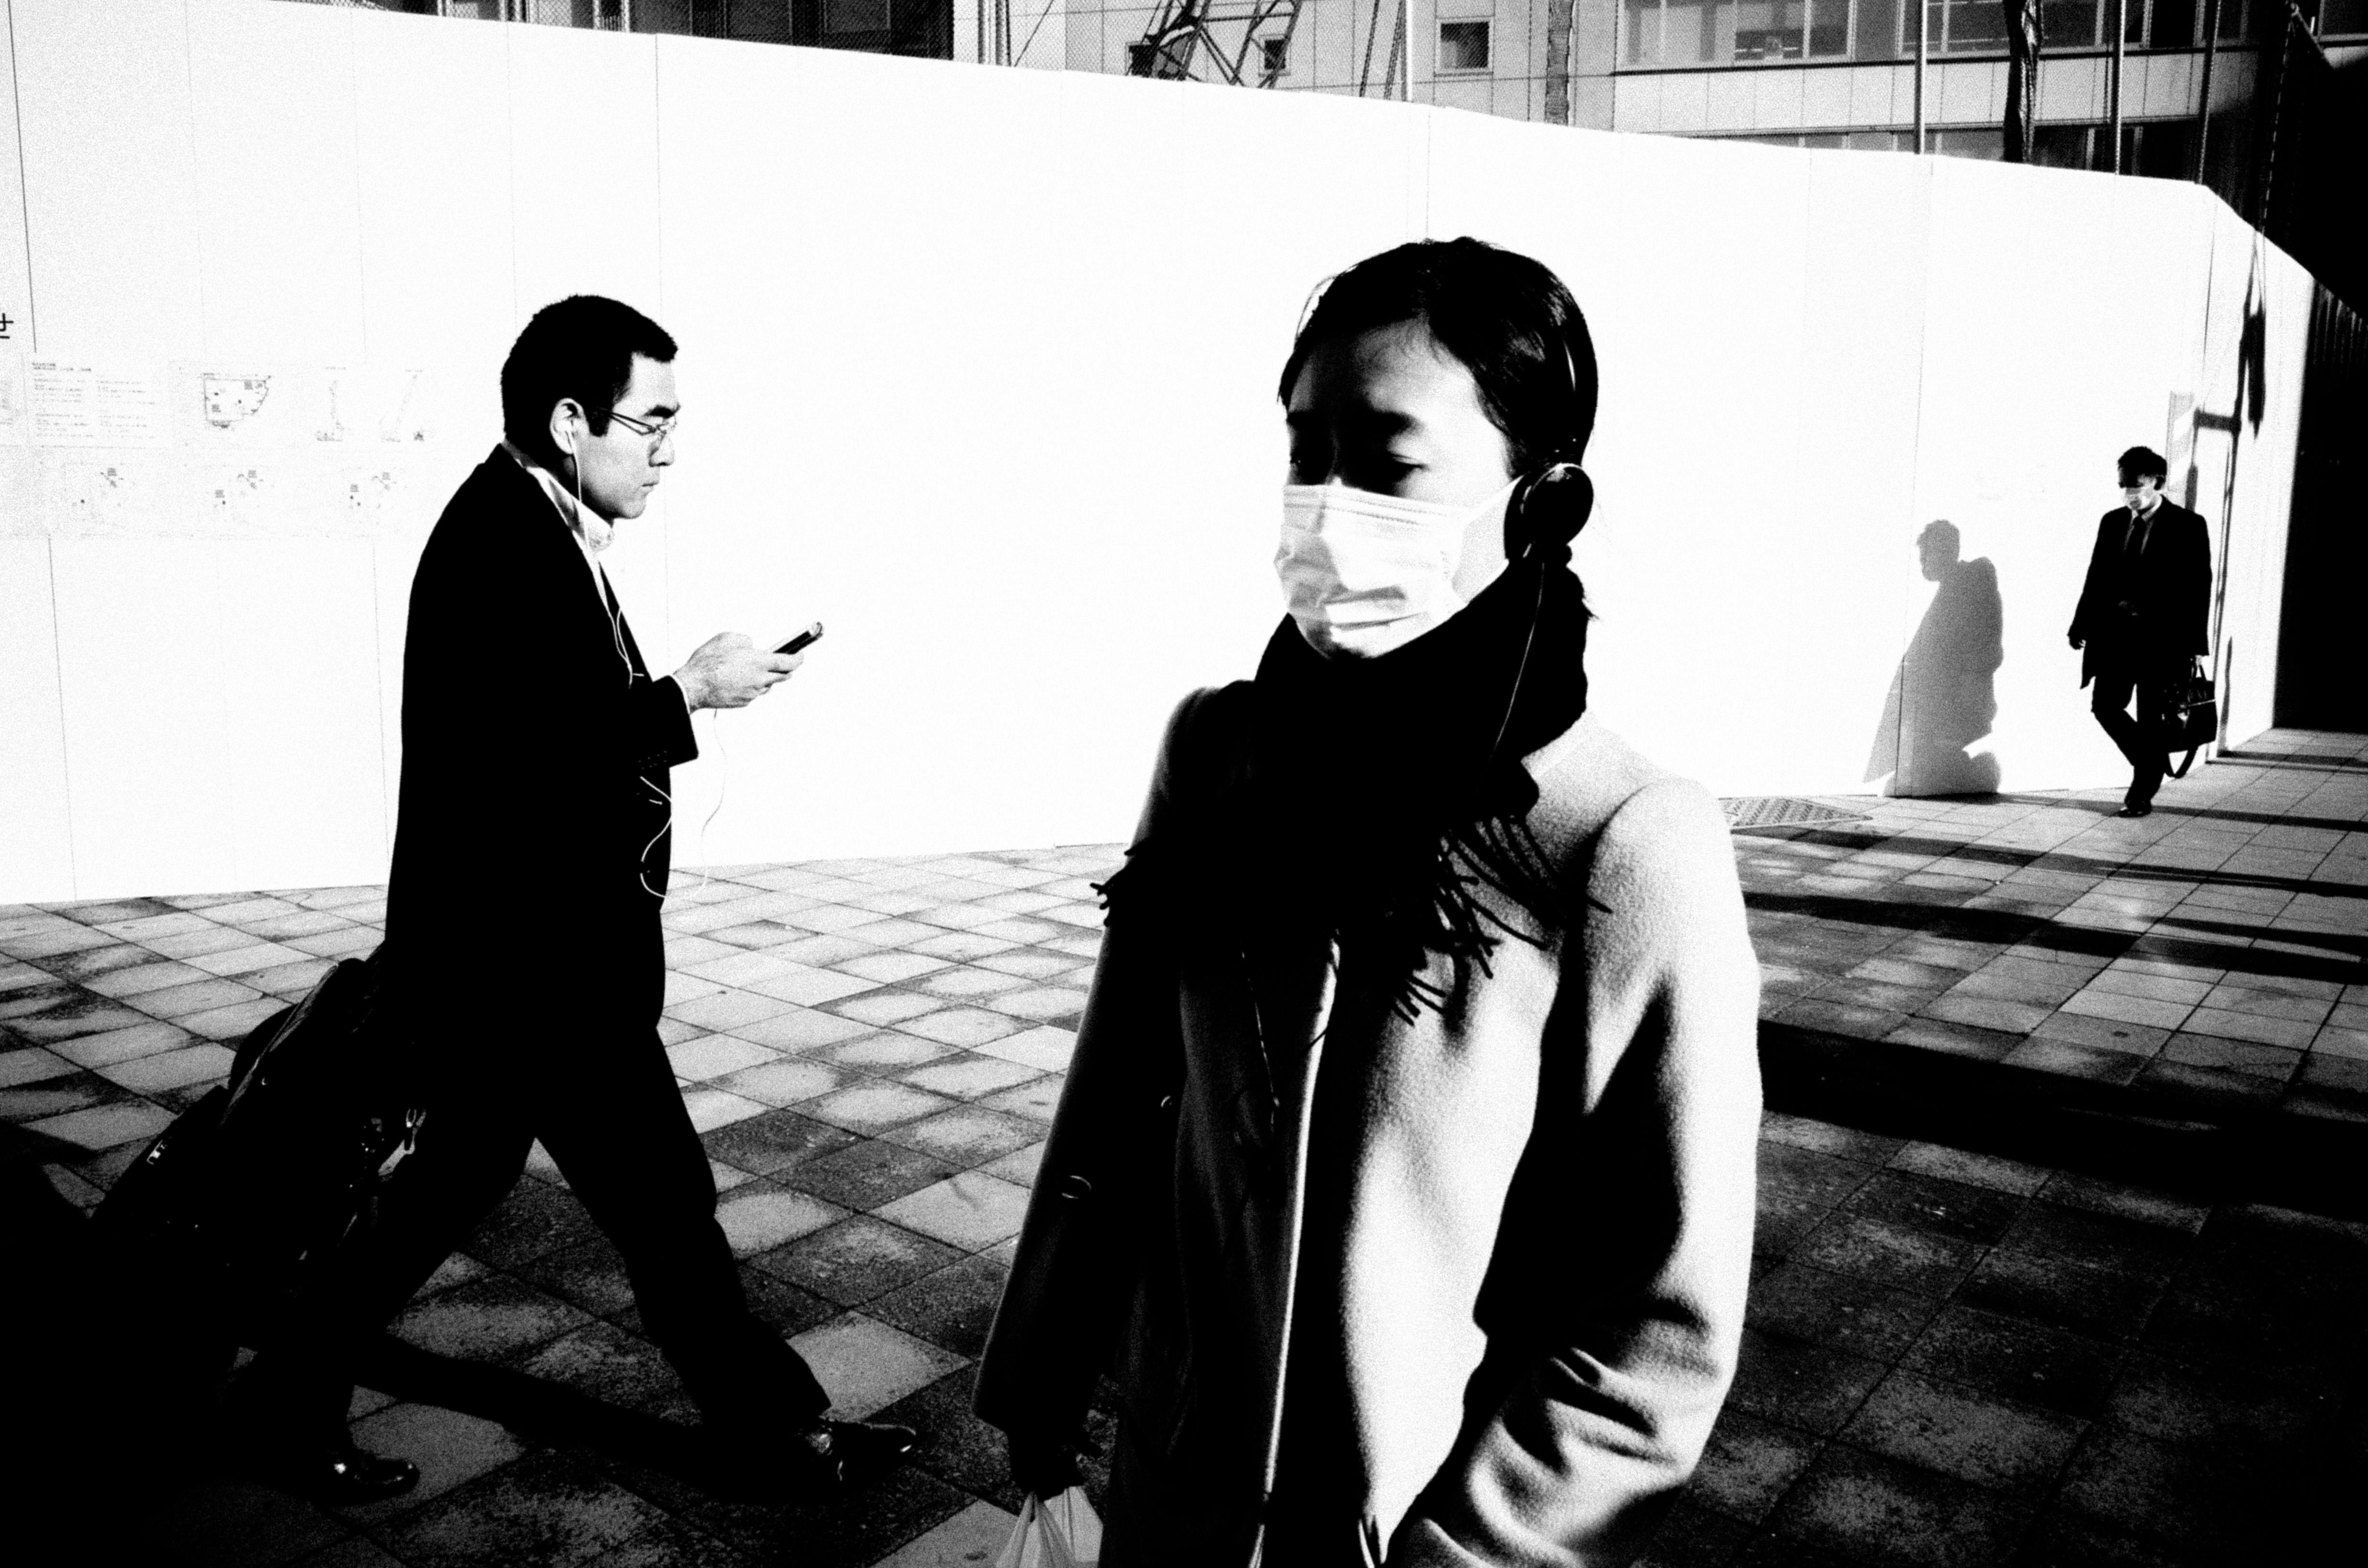 People walking at cross walk. Tokyo, 2016